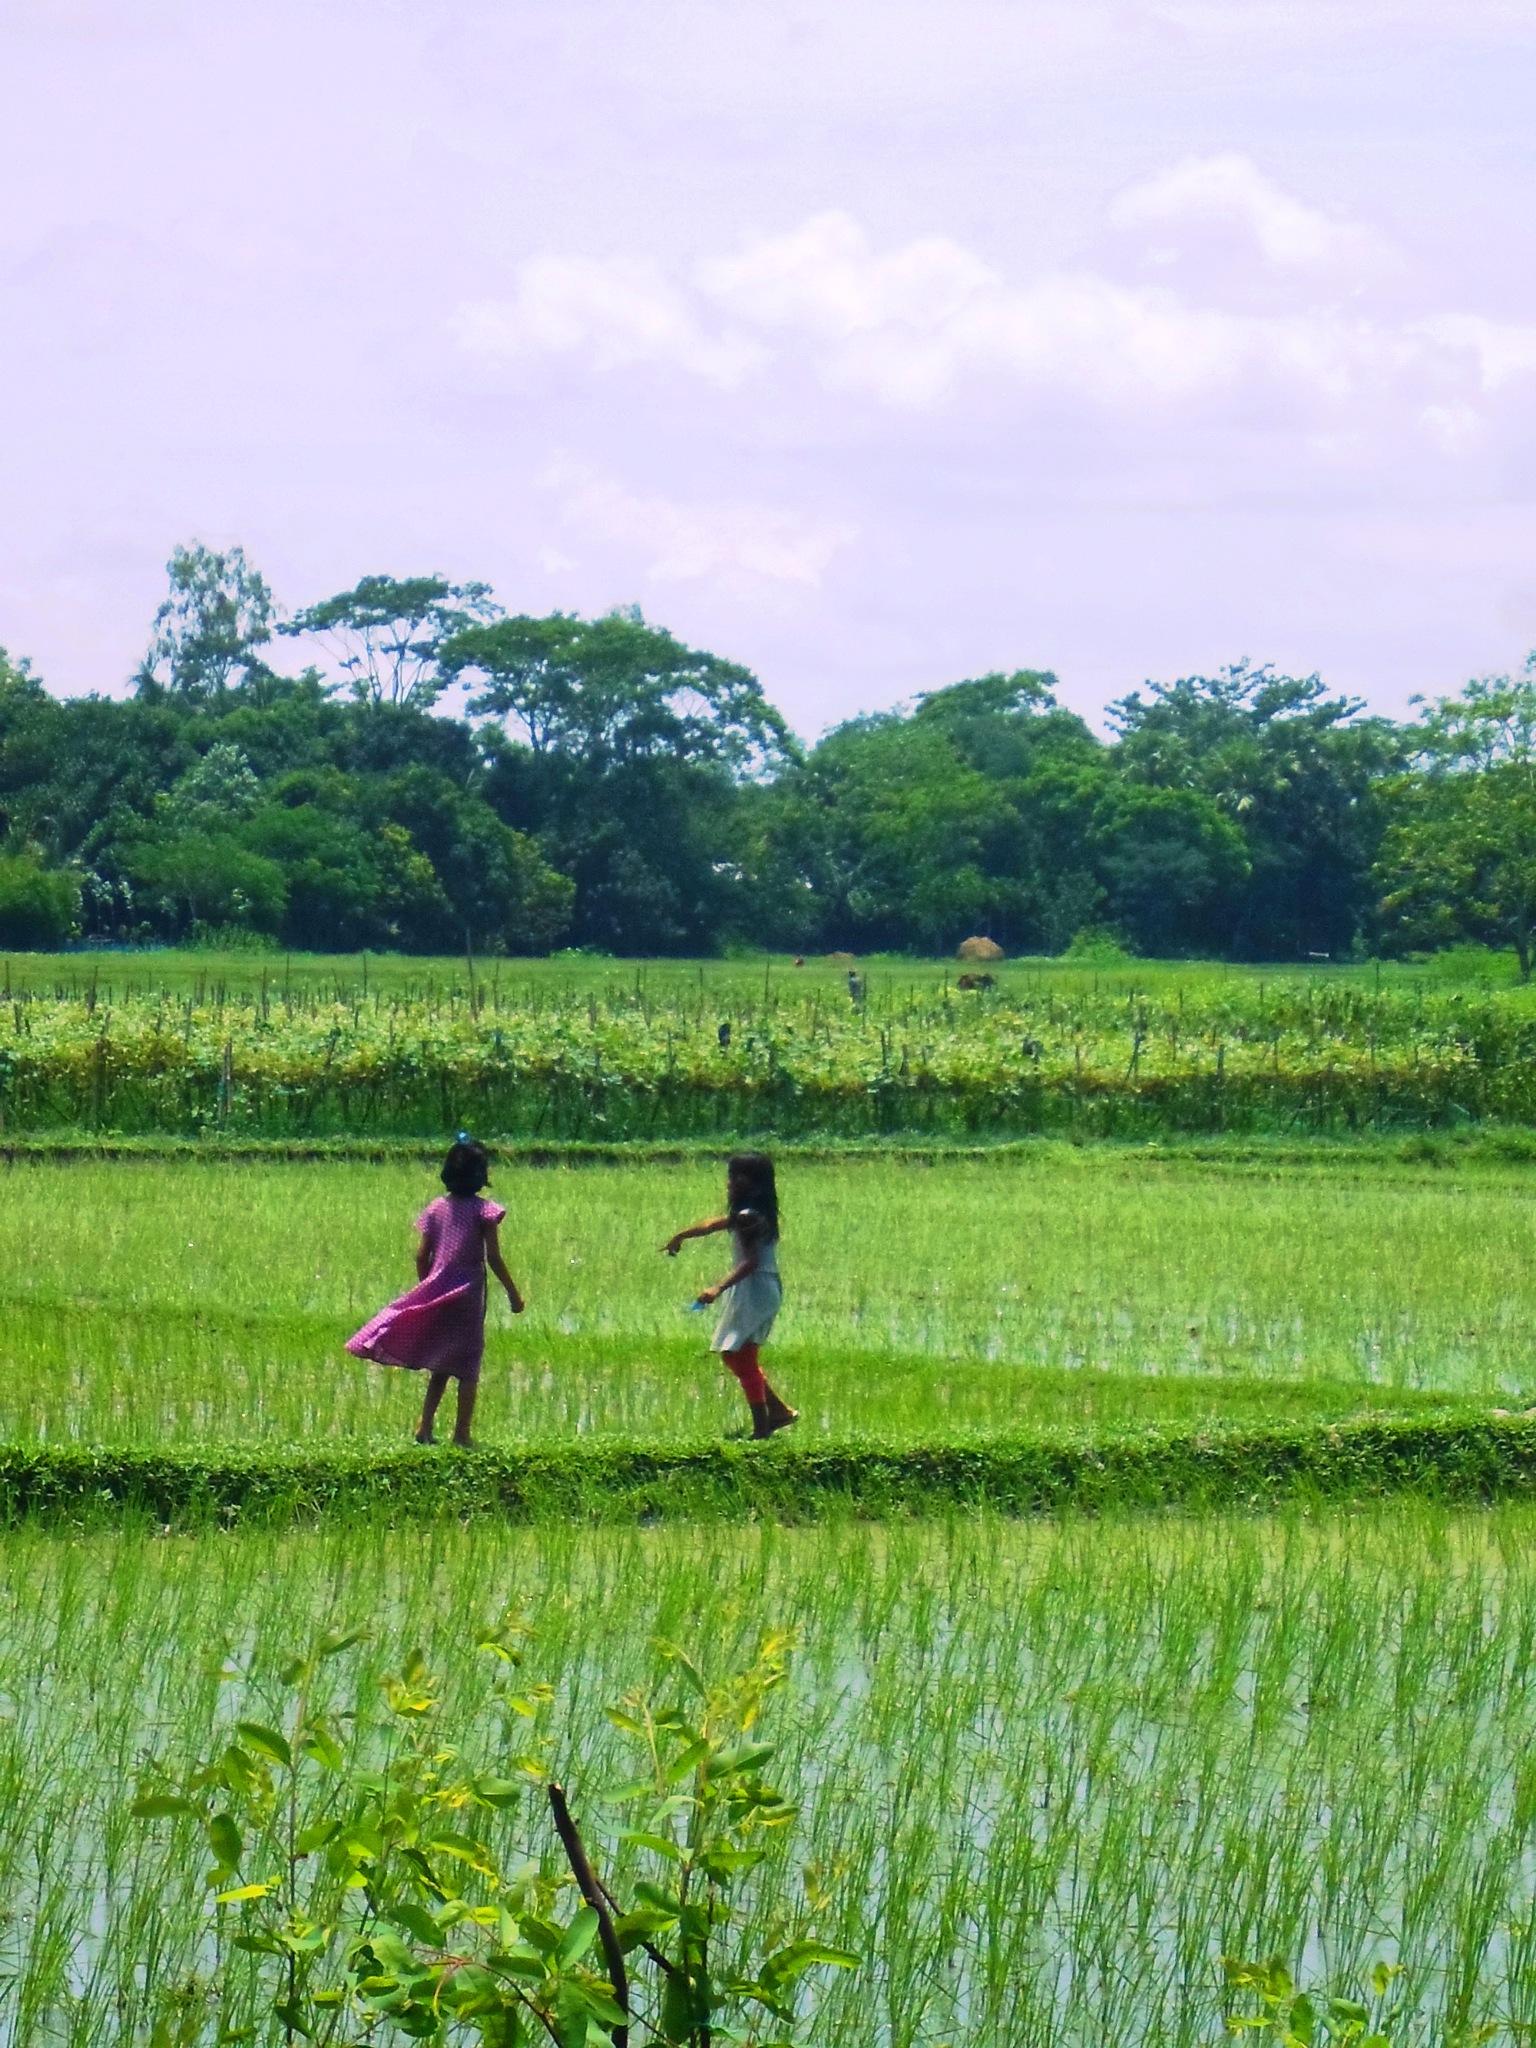 Childhood In Bangladesh by Kabir Faisal